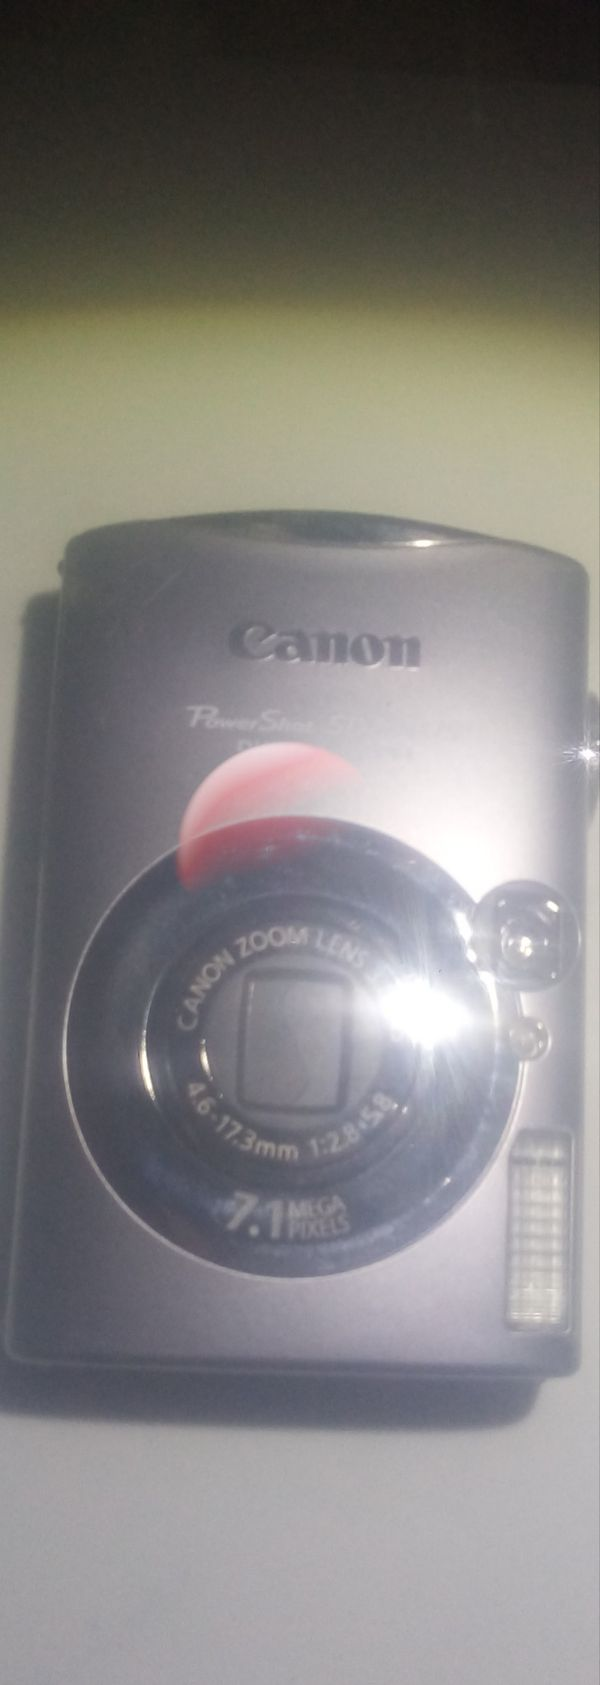 Canon Power Shot SD800 IS digital elph